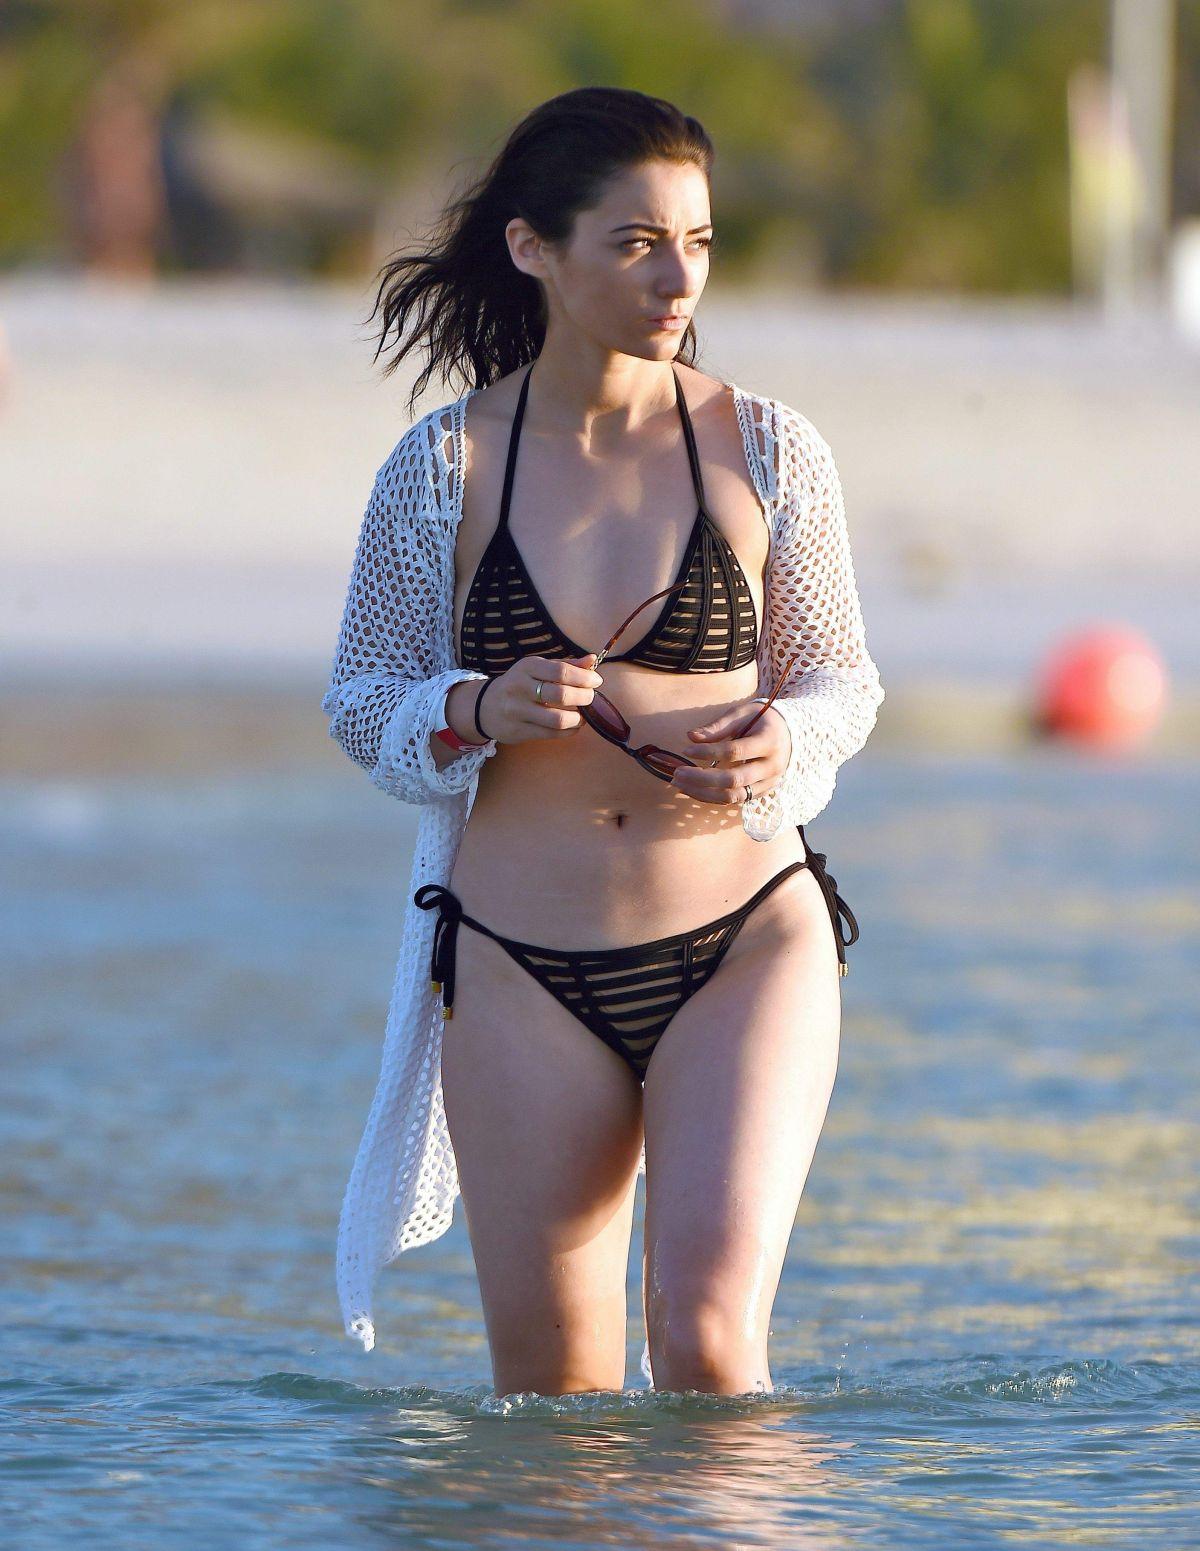 Bikini Radha Mitchell nudes (68 photo), Topless, Sideboobs, Selfie, butt 2018